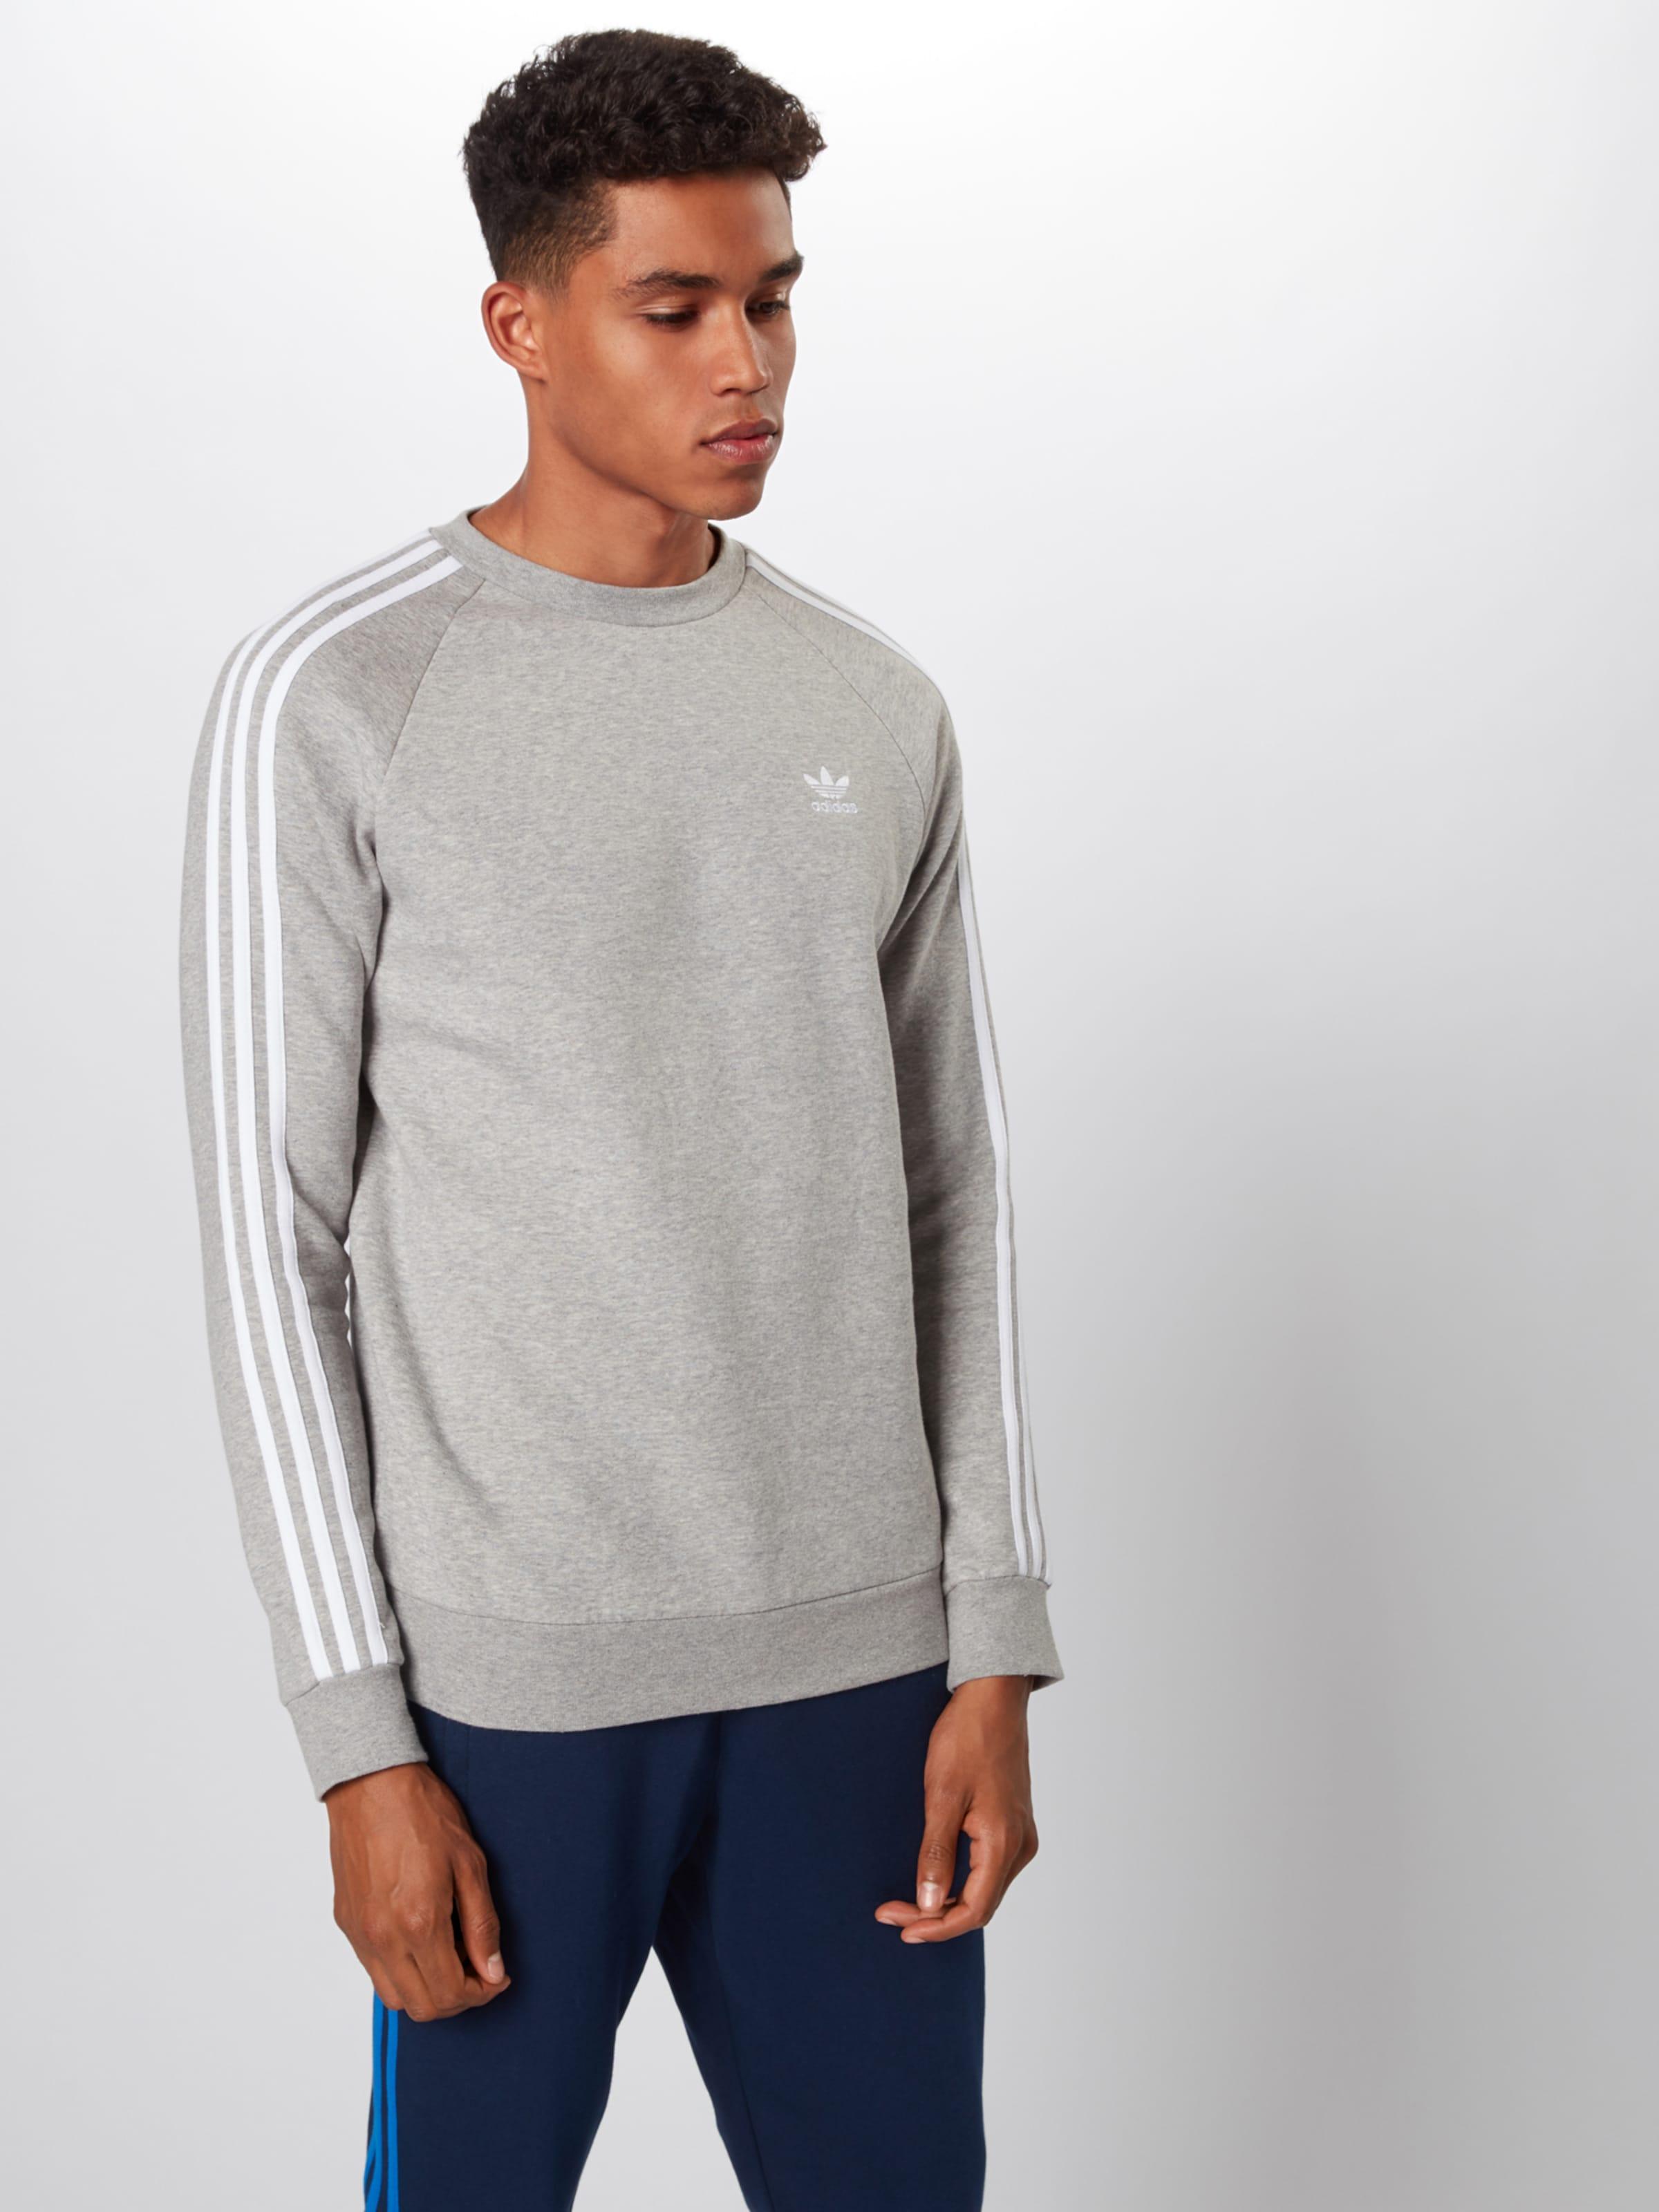 In streifen' '3 Adidas Sweatshirt Originals Hellgrau j4RL5A